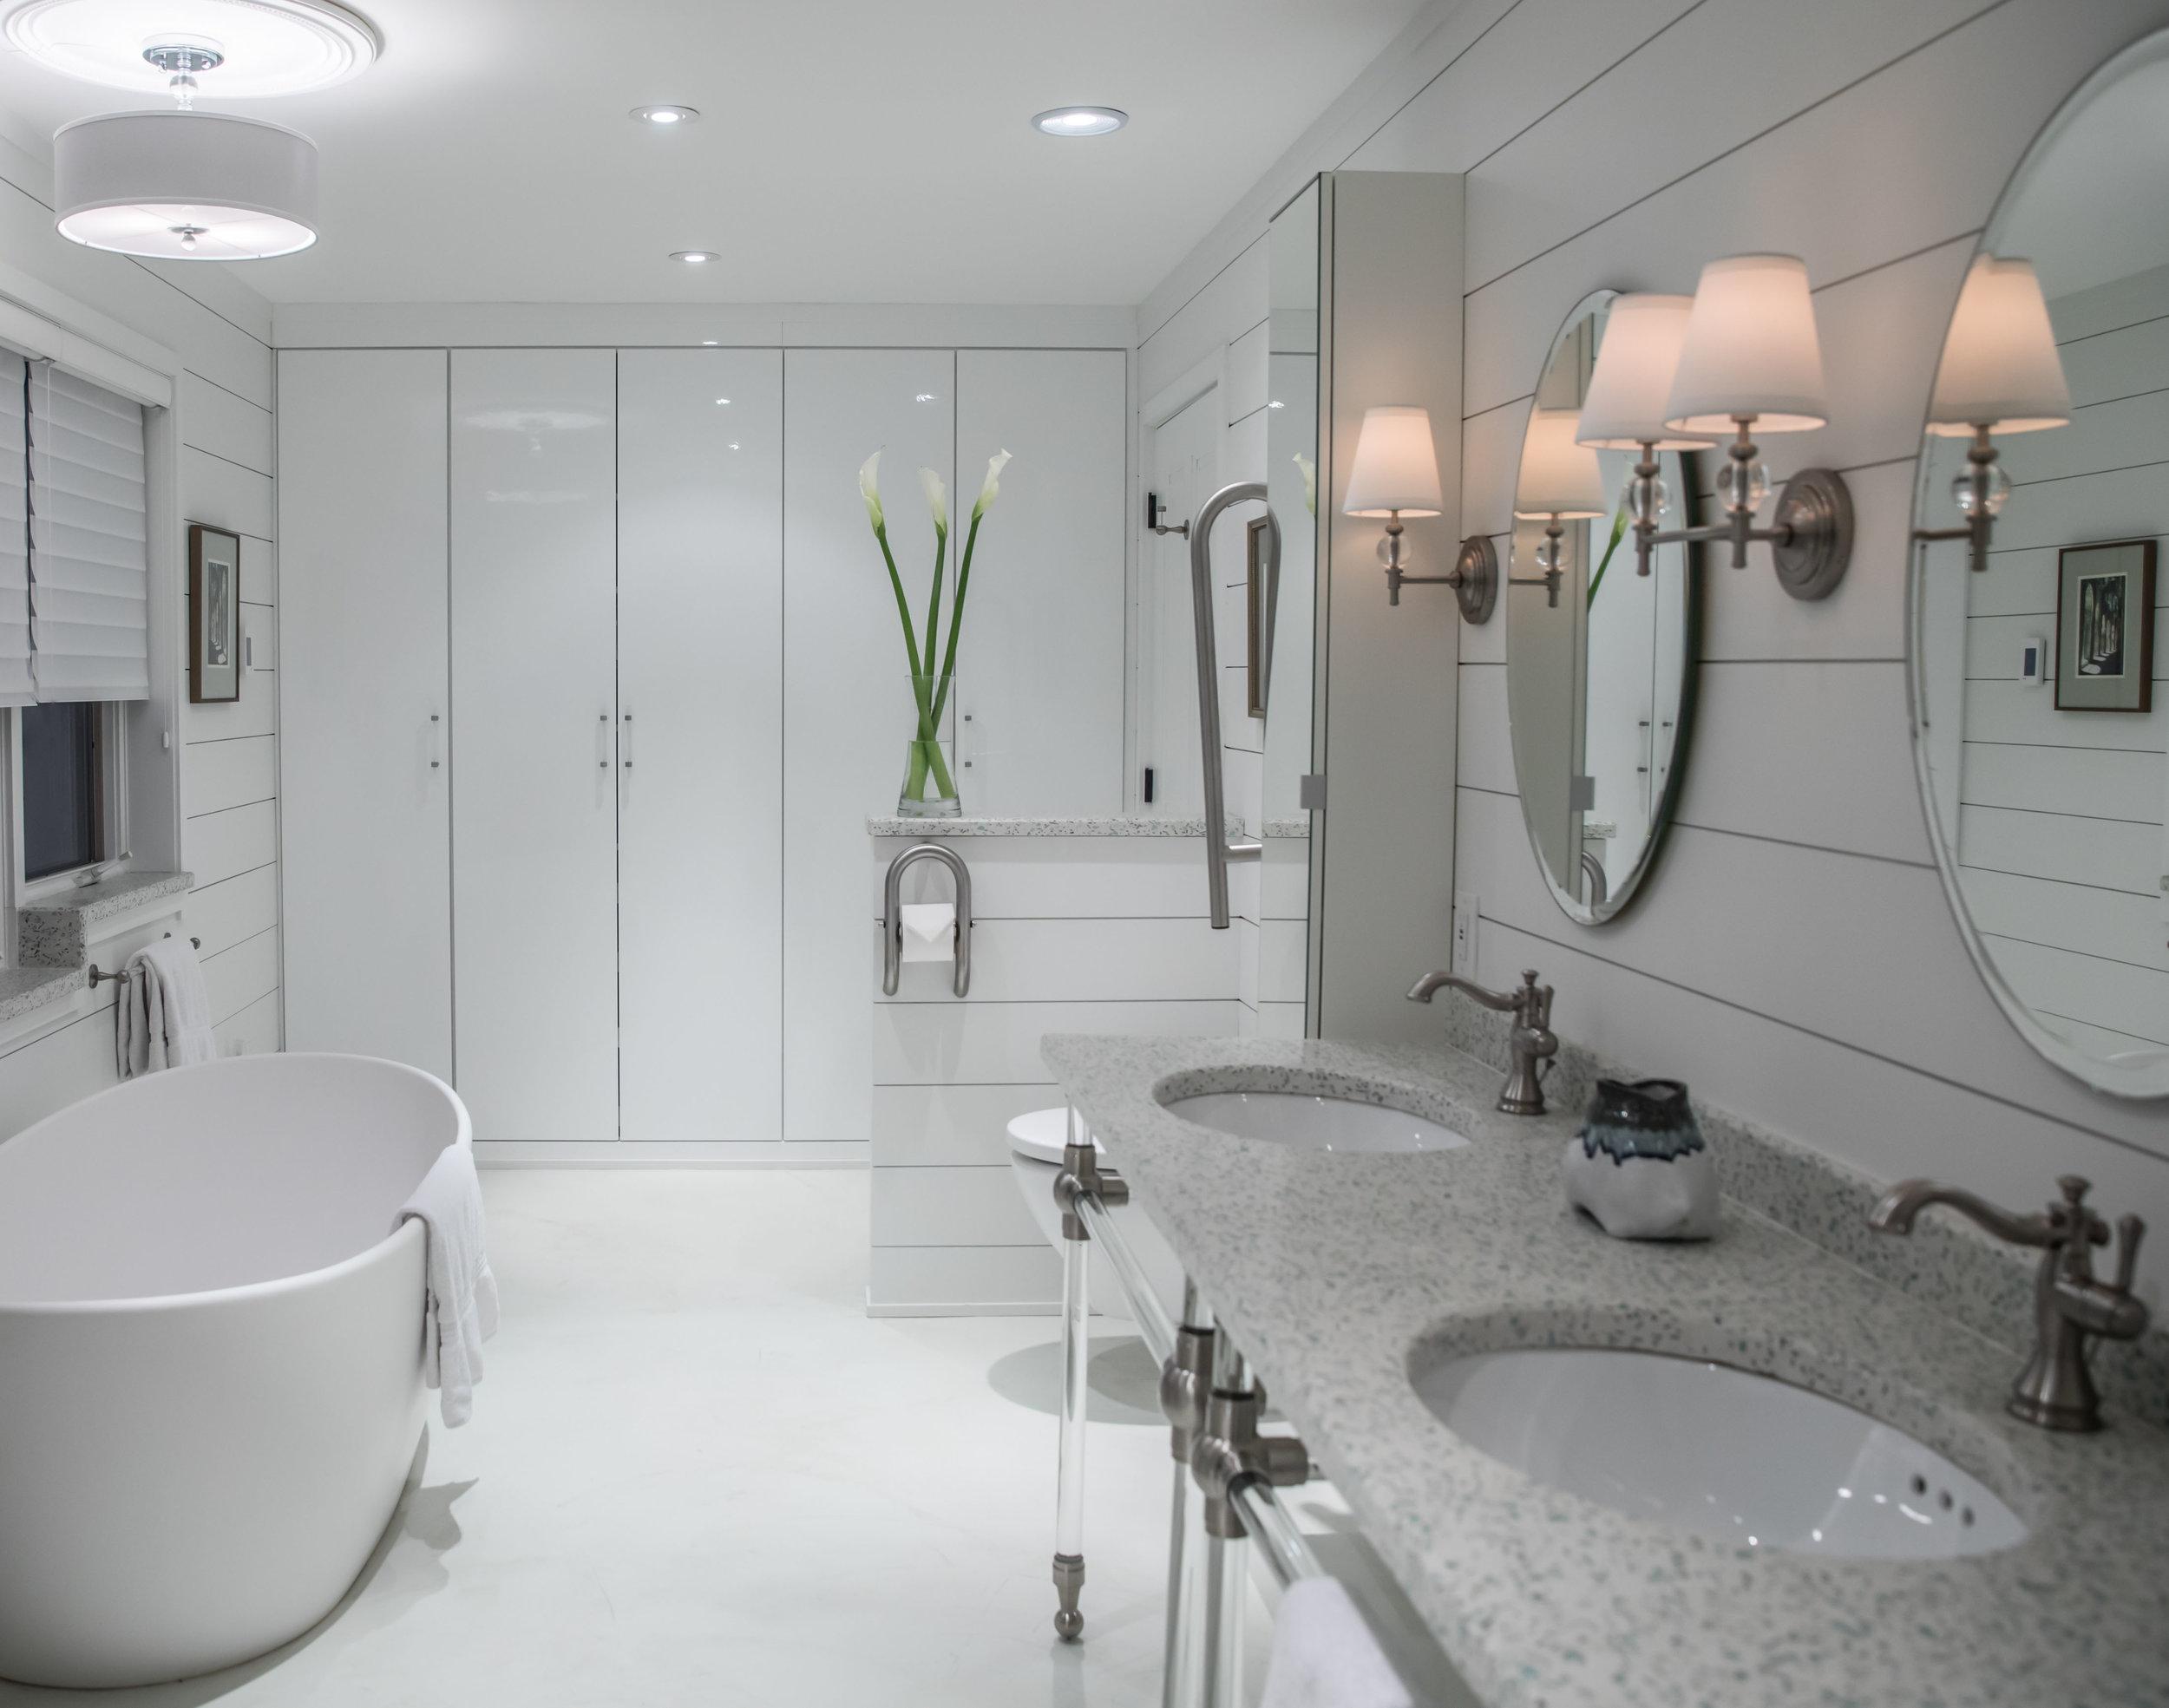 BEST BATH DESIGN CRBRA 2017